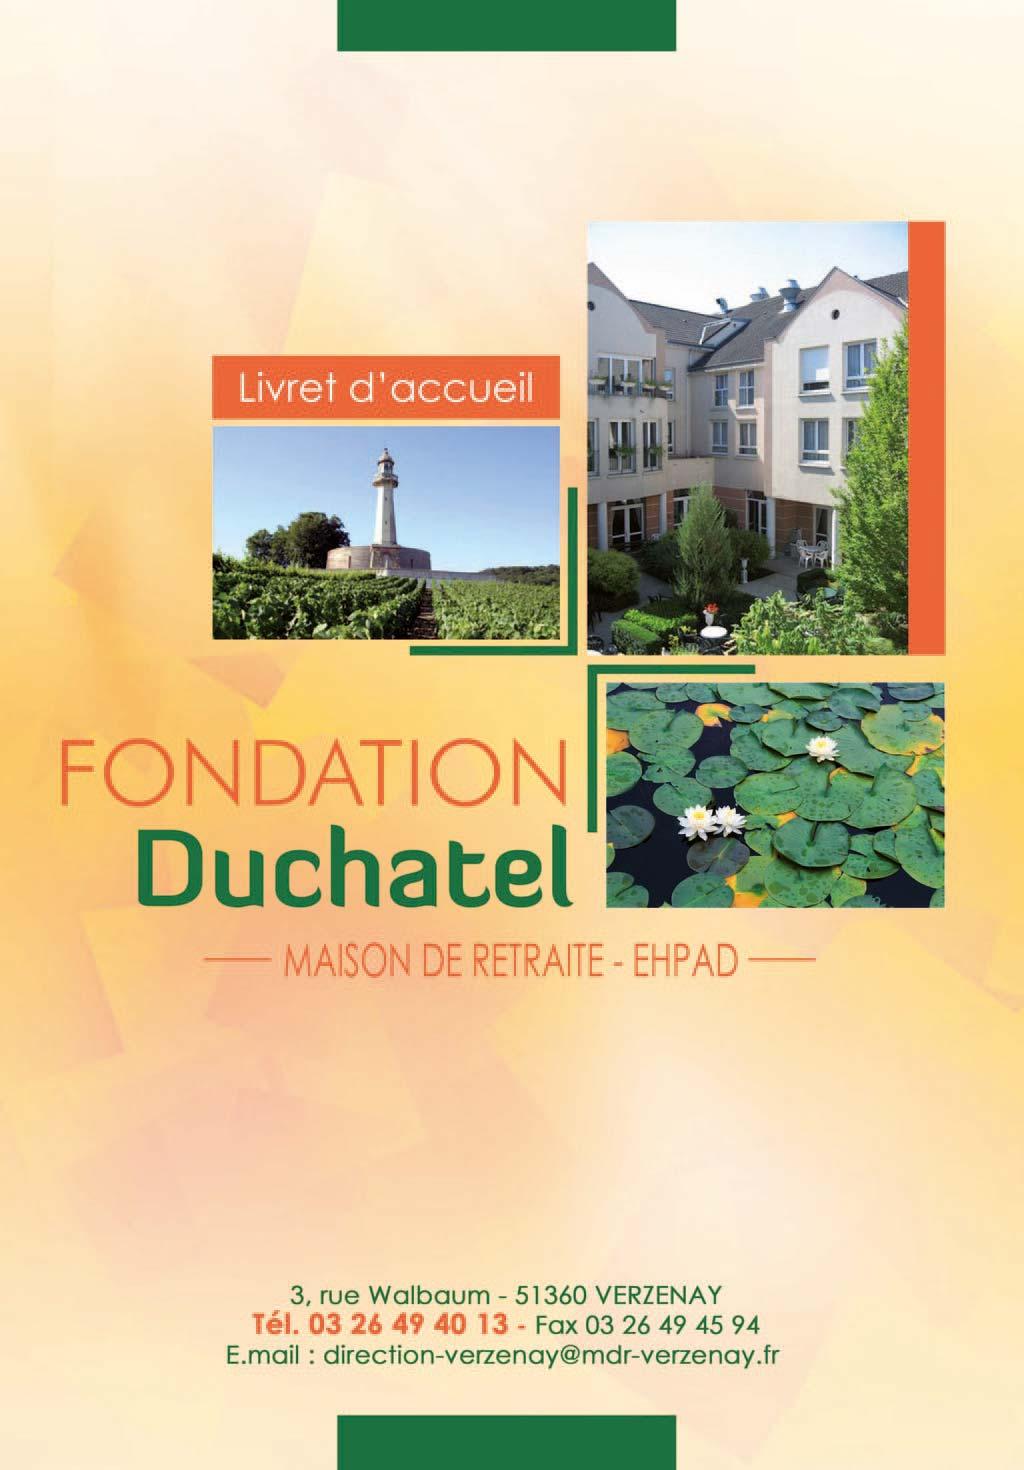 EHPAD Fondation Duchatel, EHPAD Verzenay 51360